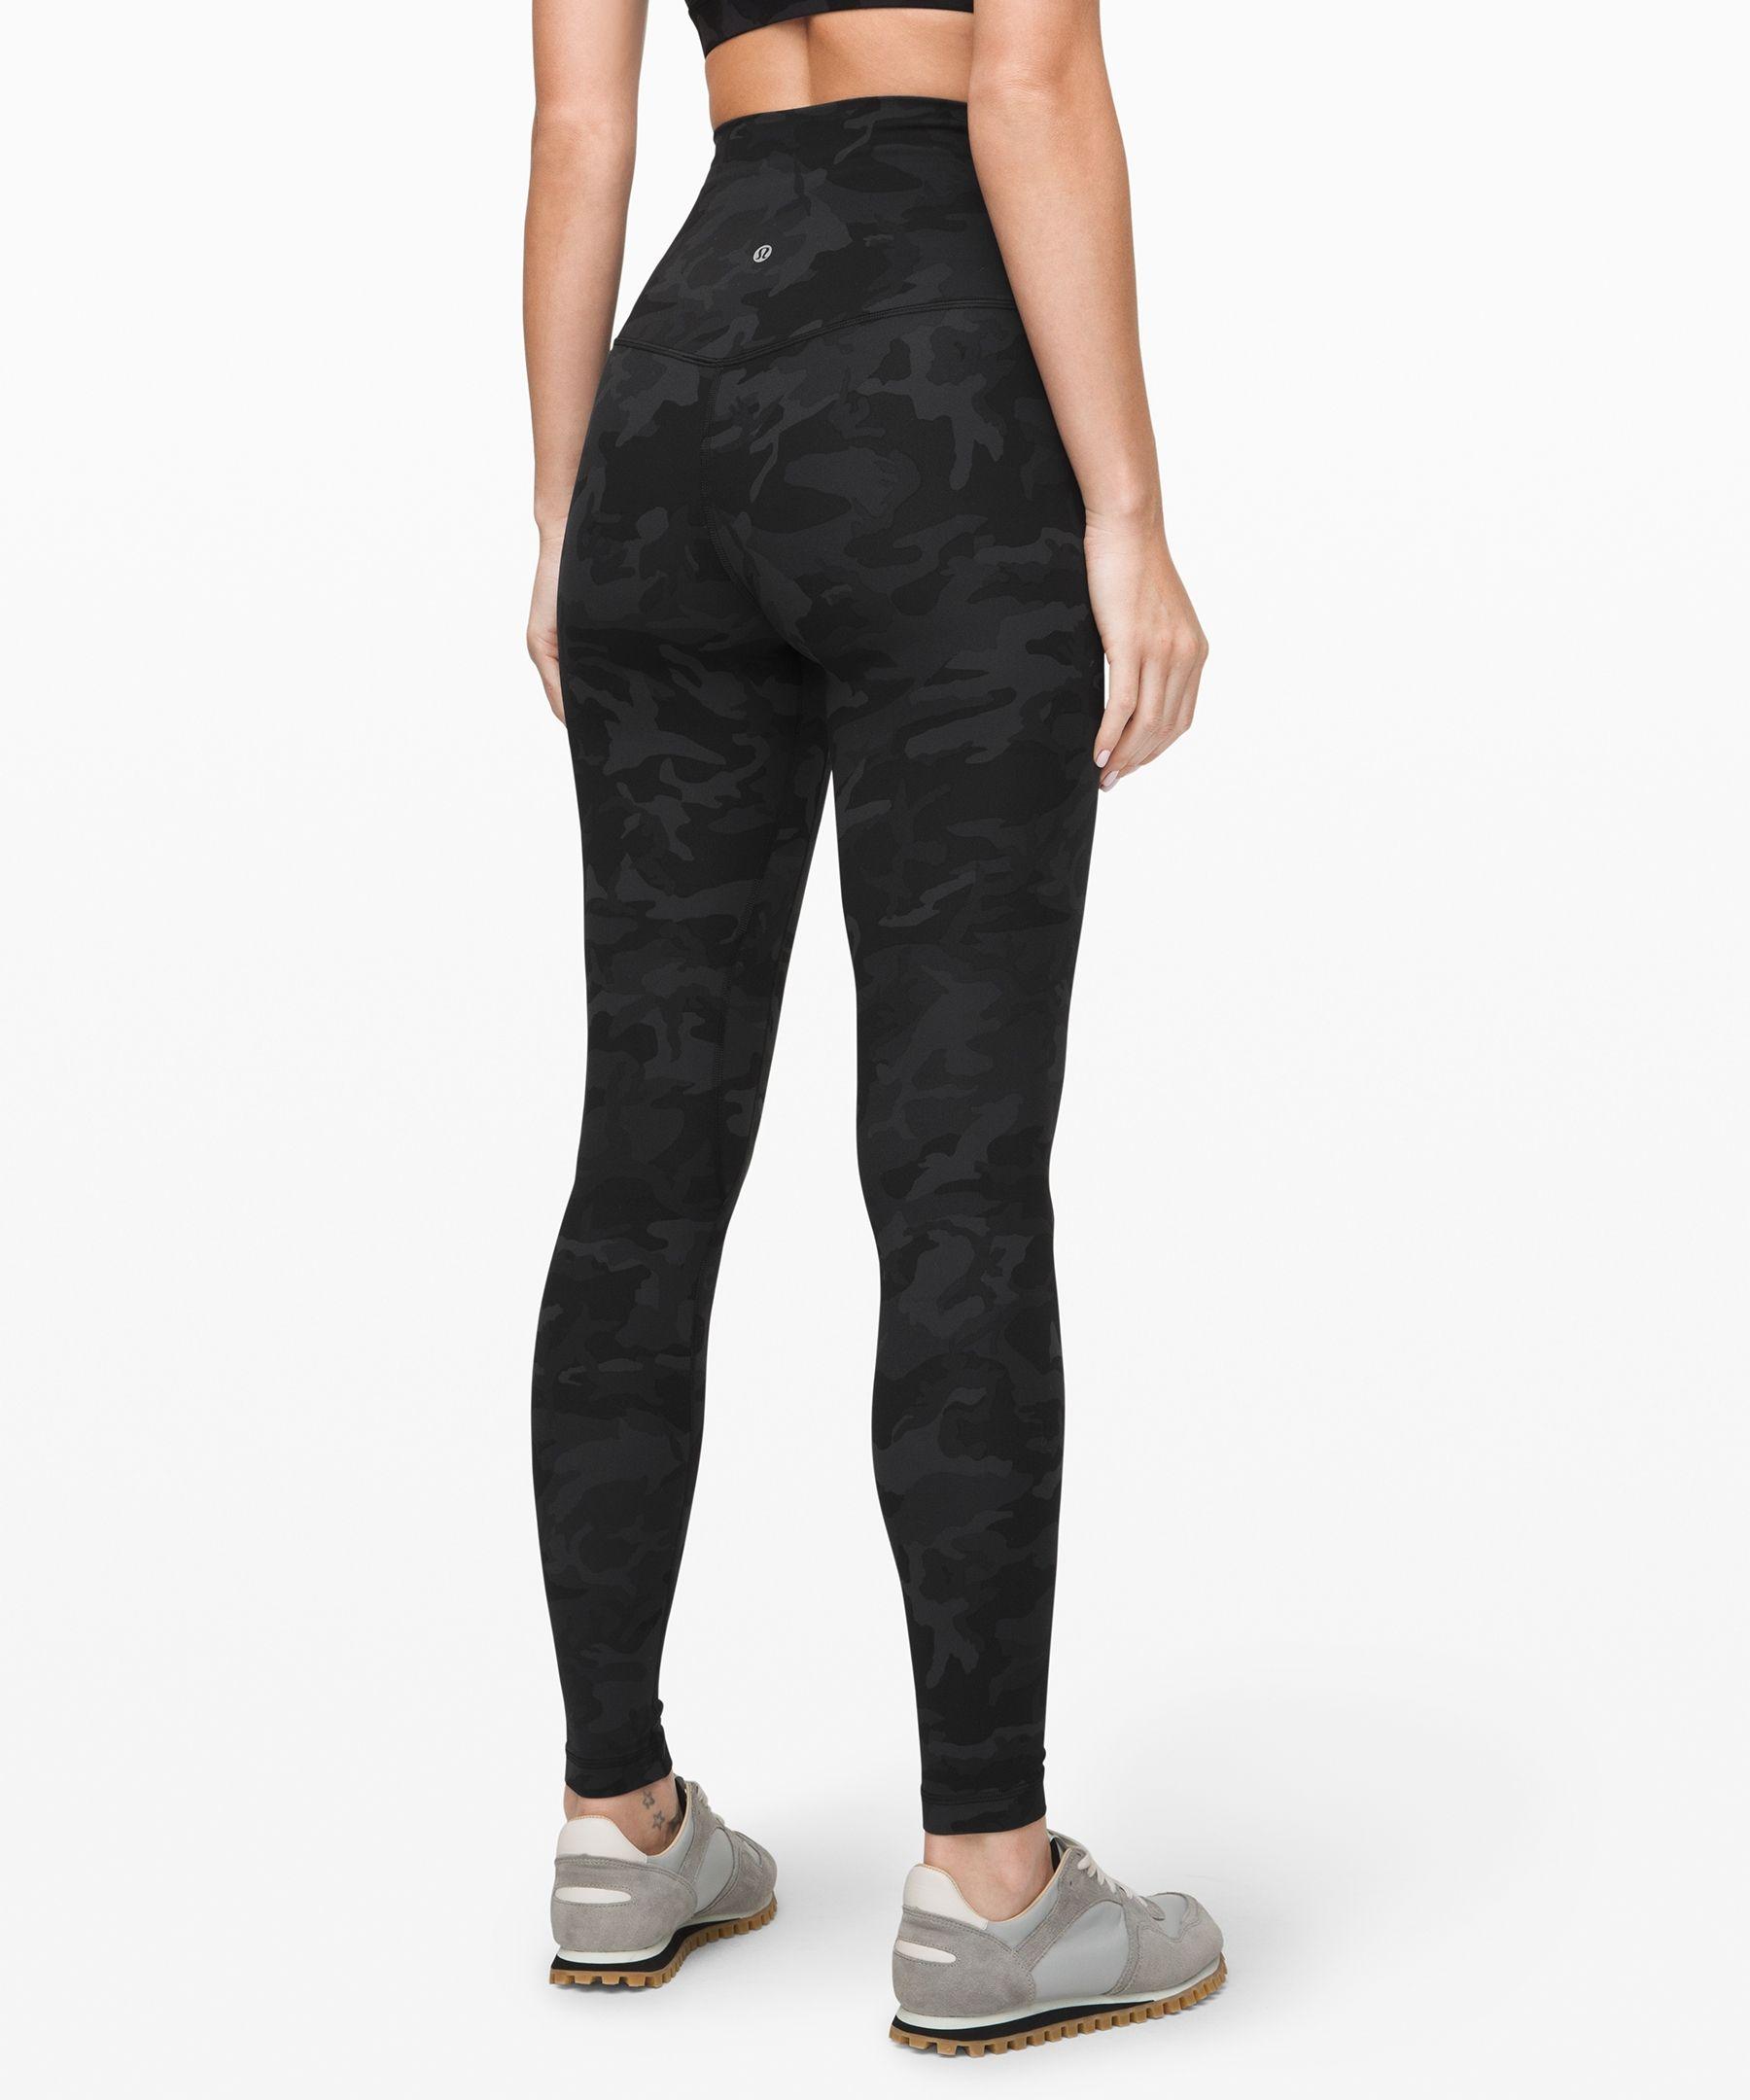 Align Super High Rise Pant 28 Women S Pants Lululemon Pants For Women Pants High Rise Pants